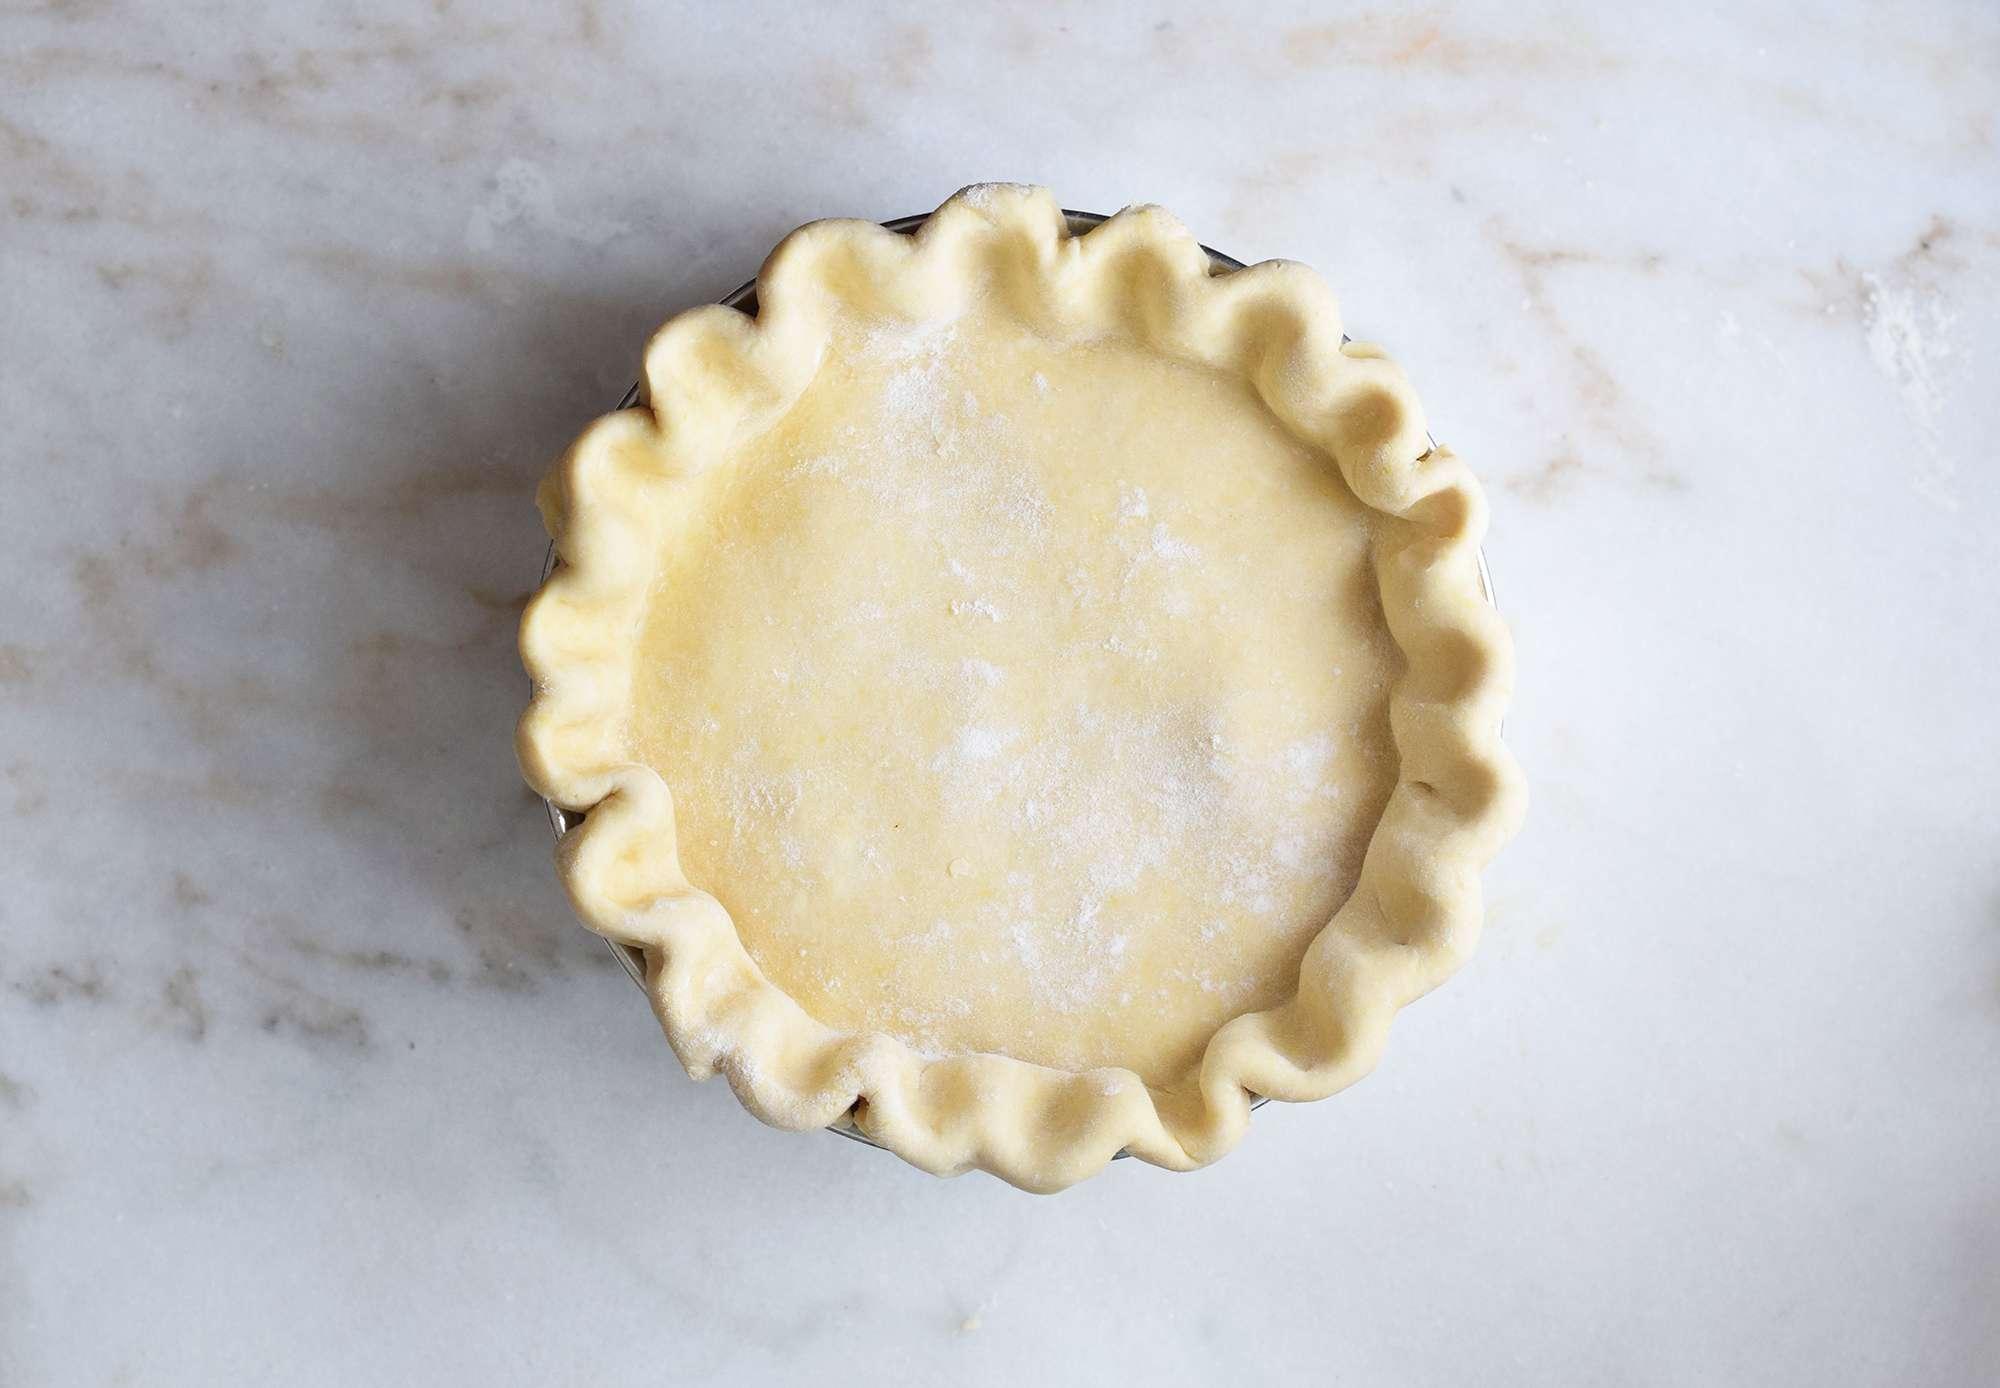 pie crust crimped on top